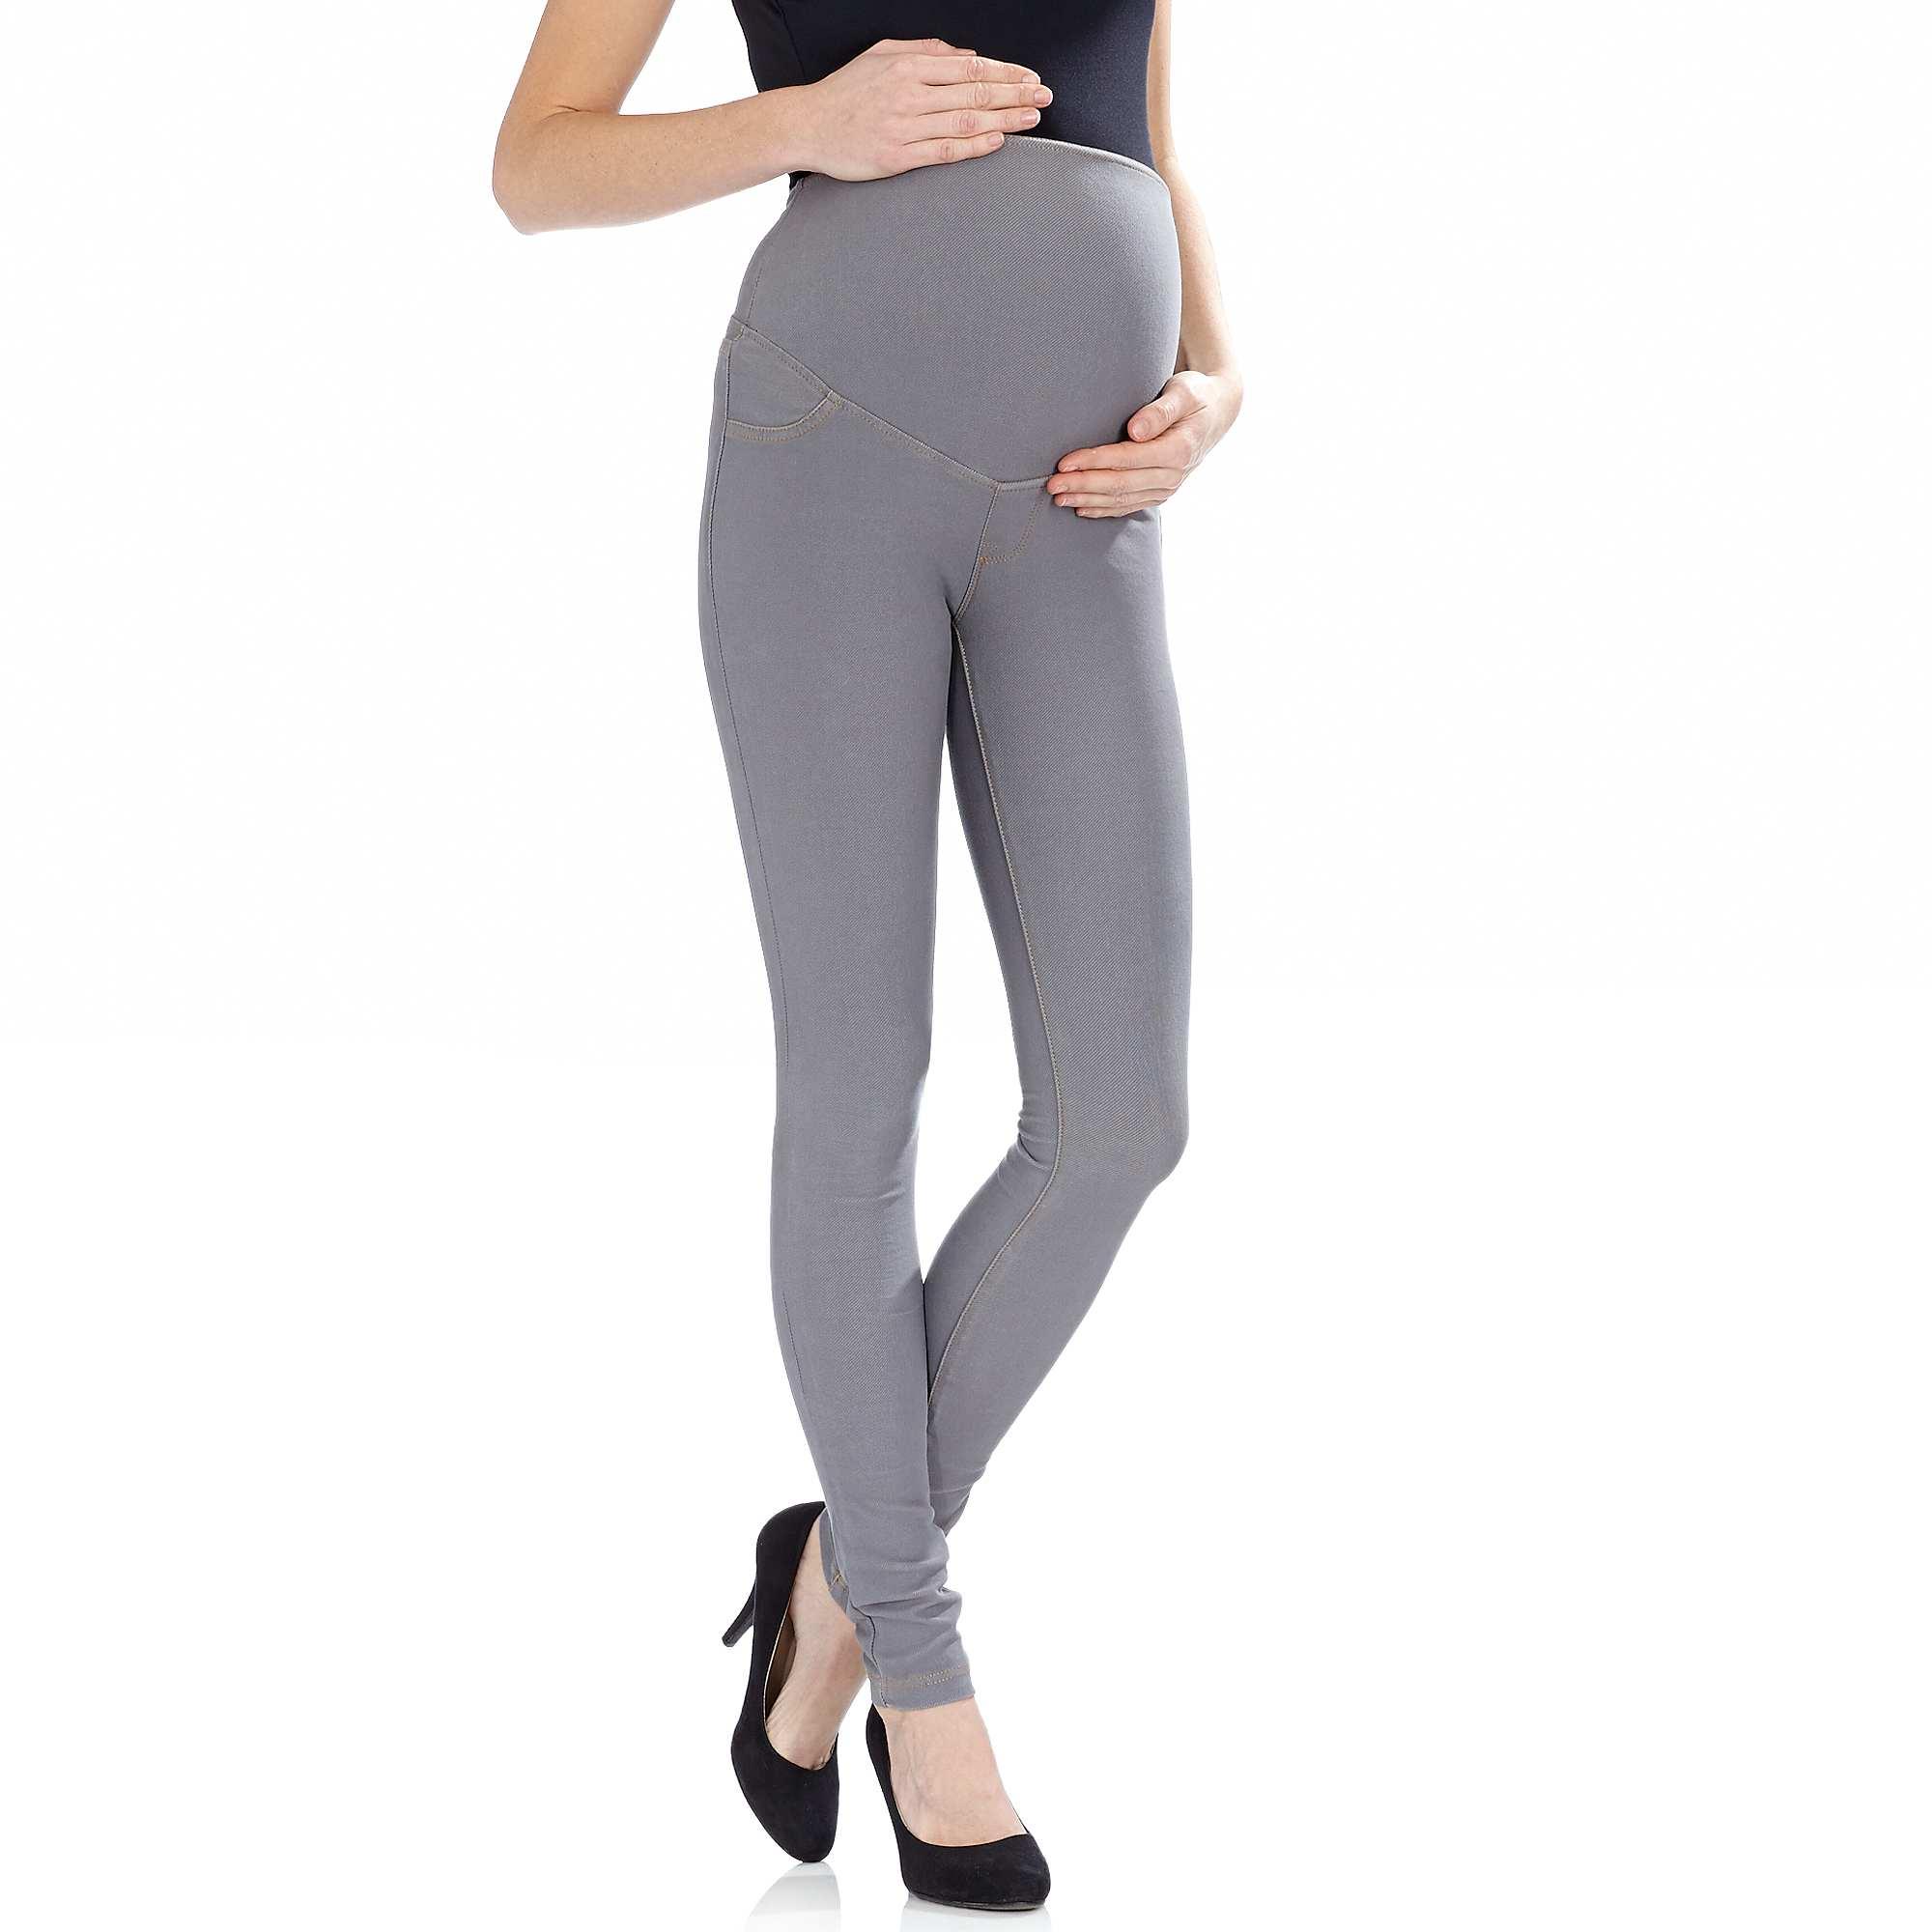 7eca83fa6df2 leggings-jeans-fascia-maglia-denim-grigio-premaman-ft108 1 zc1 1999